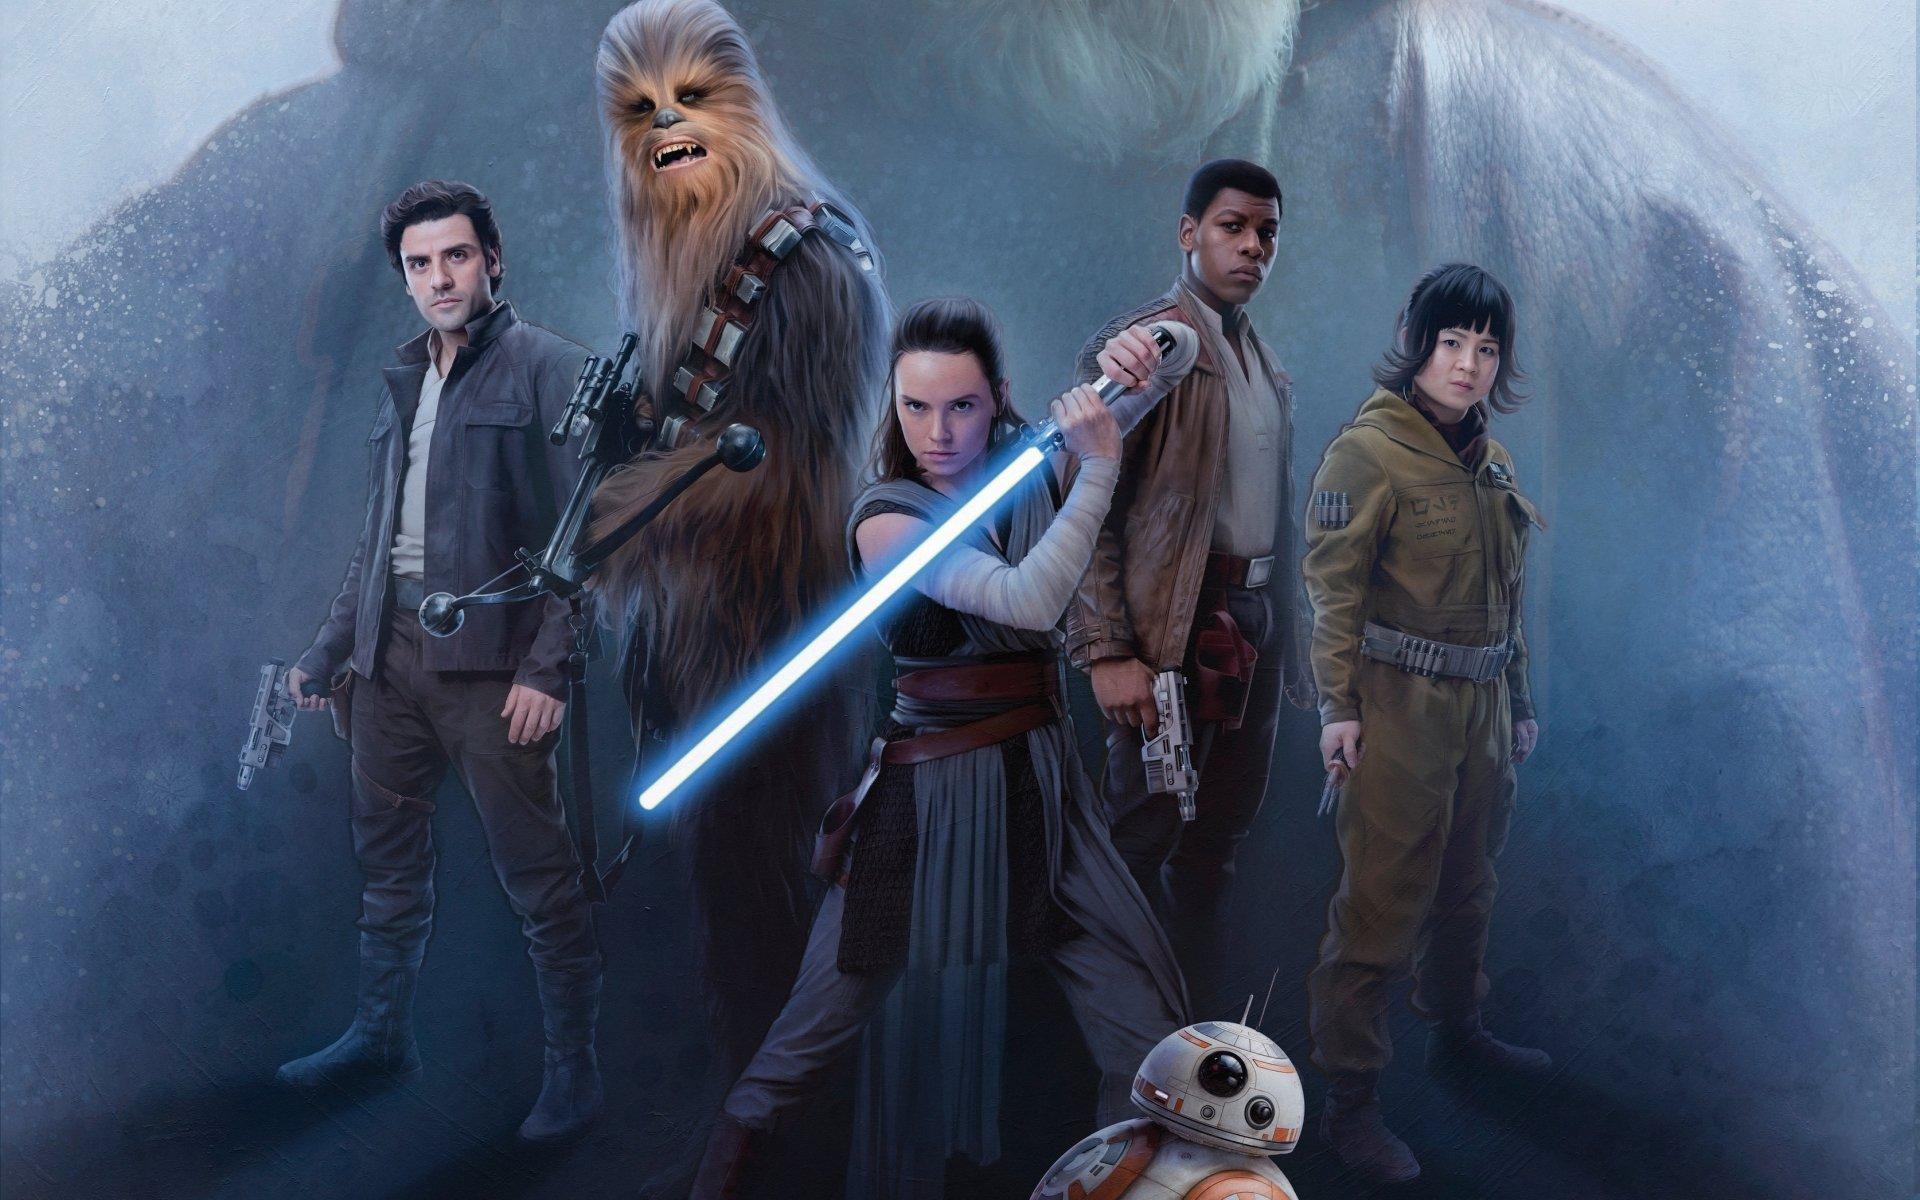 Fondos De Star Wars Viii Los Ultimos Jedi The Last Jedi